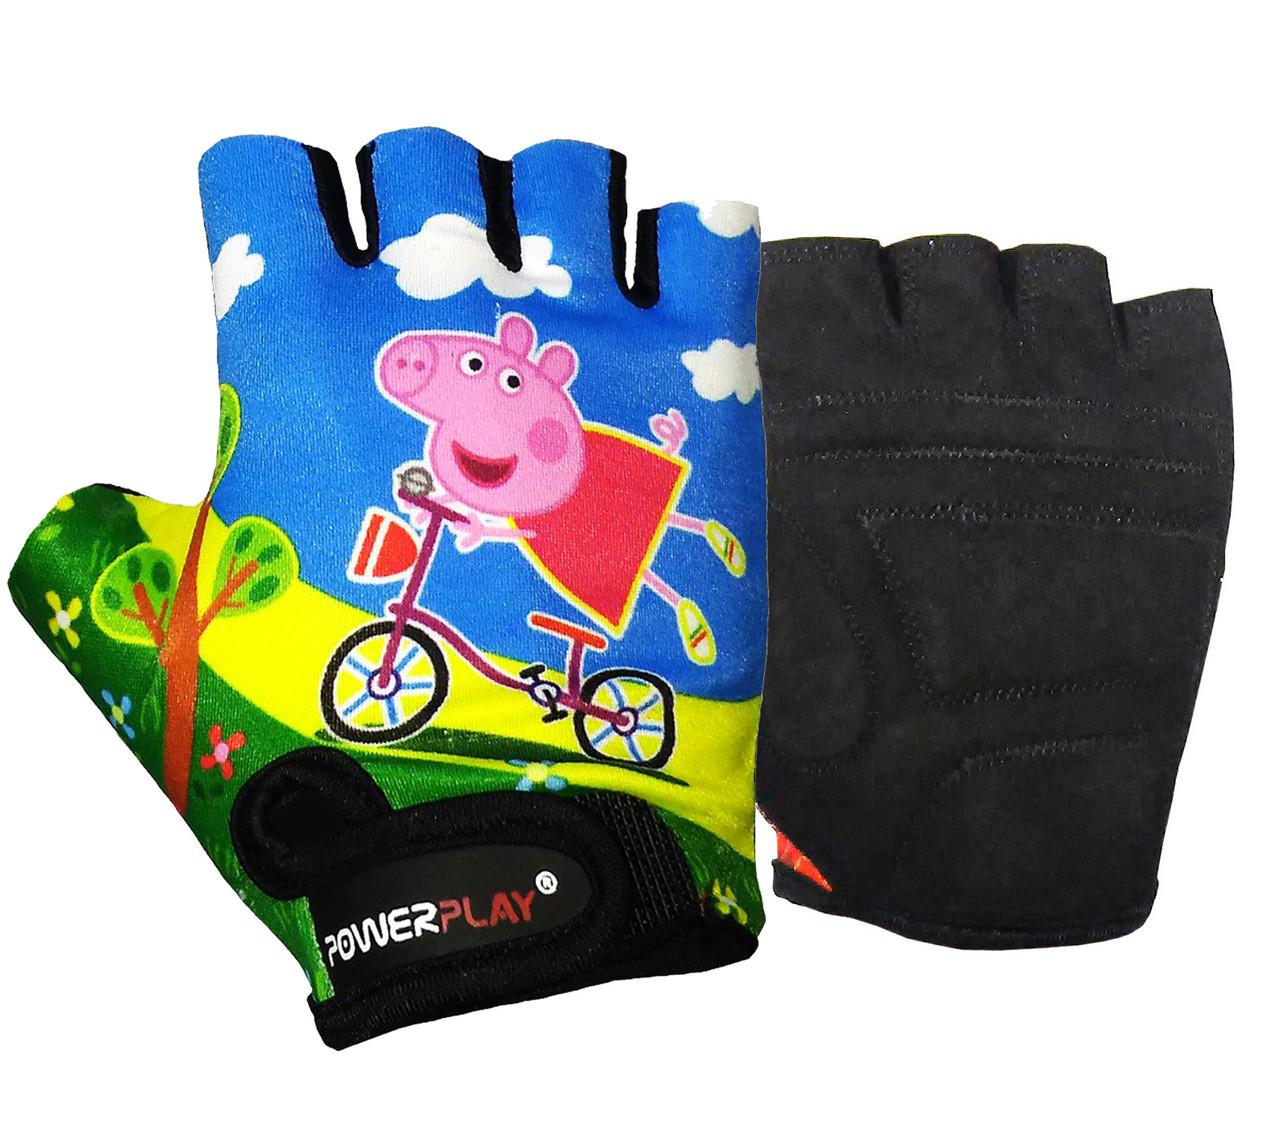 Велоперчатки детские PowerPlay 5473 Peppa Pig голубые 4XS